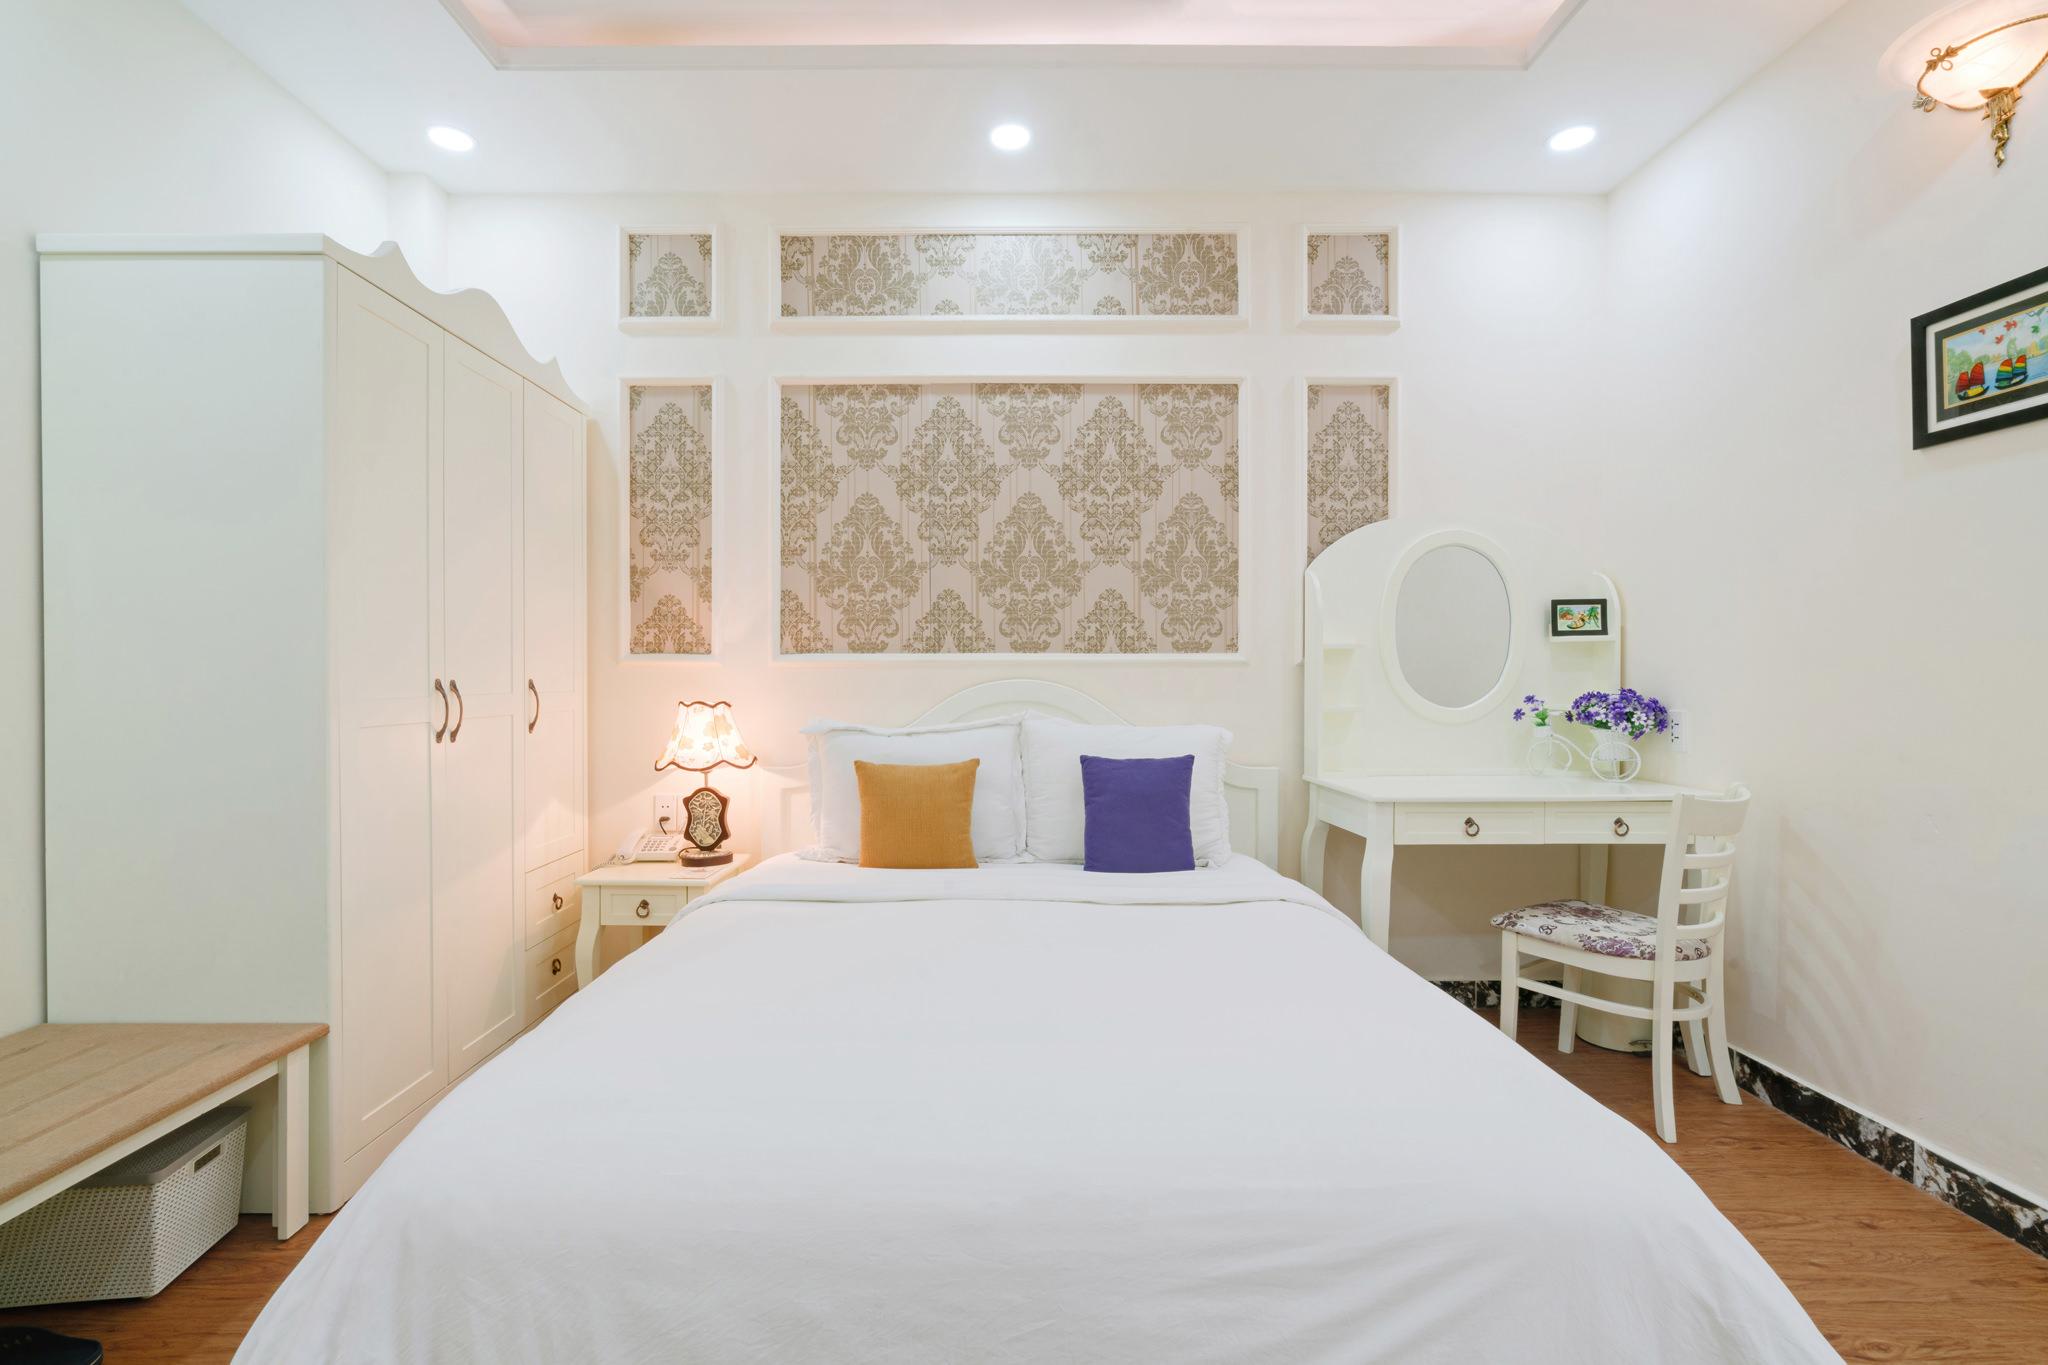 20180529 - Chez Mimosa - Interior - Hotel - 031.jpg